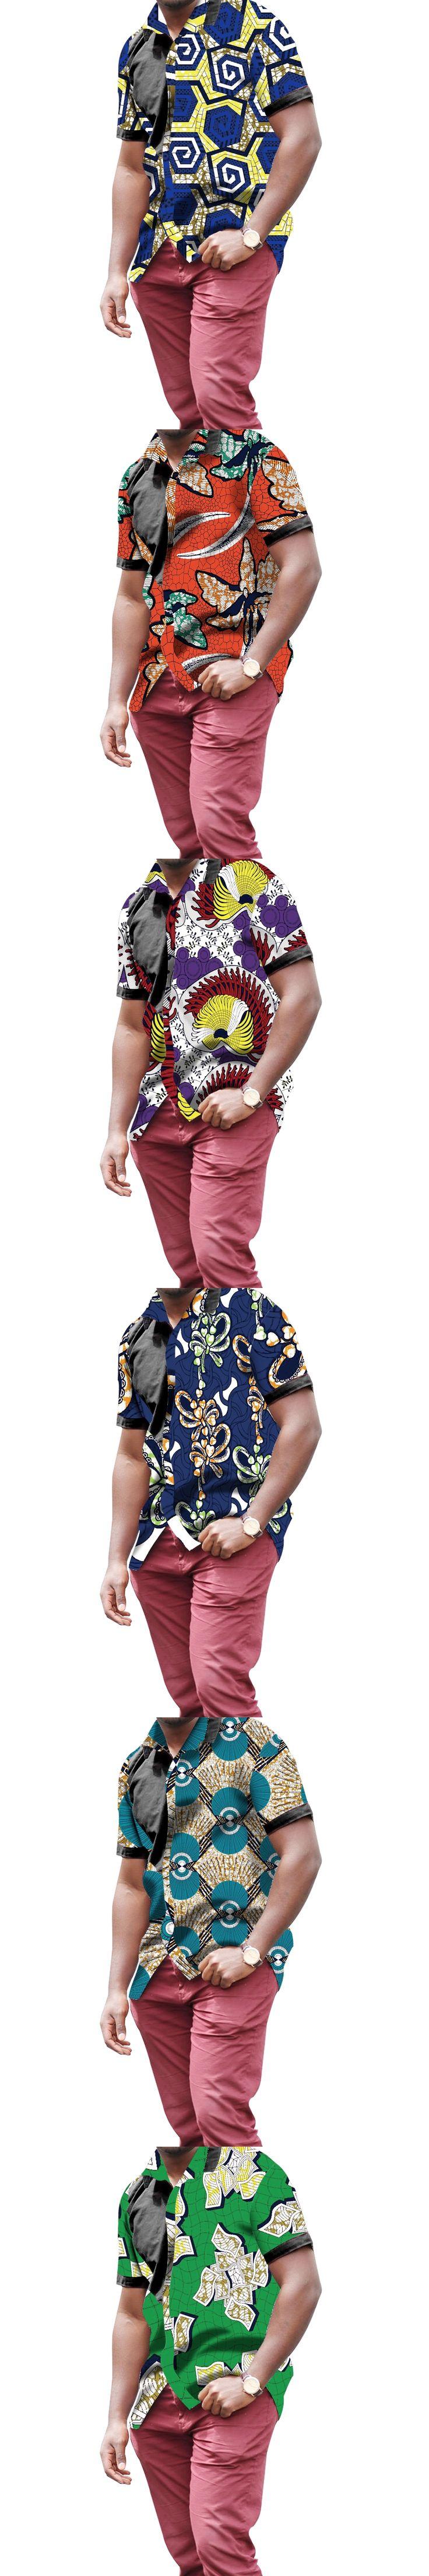 Men's African Shirts Africa Festive Pattern Long Sleeve Shirts Men Fashion Print African Men Clothing Customized